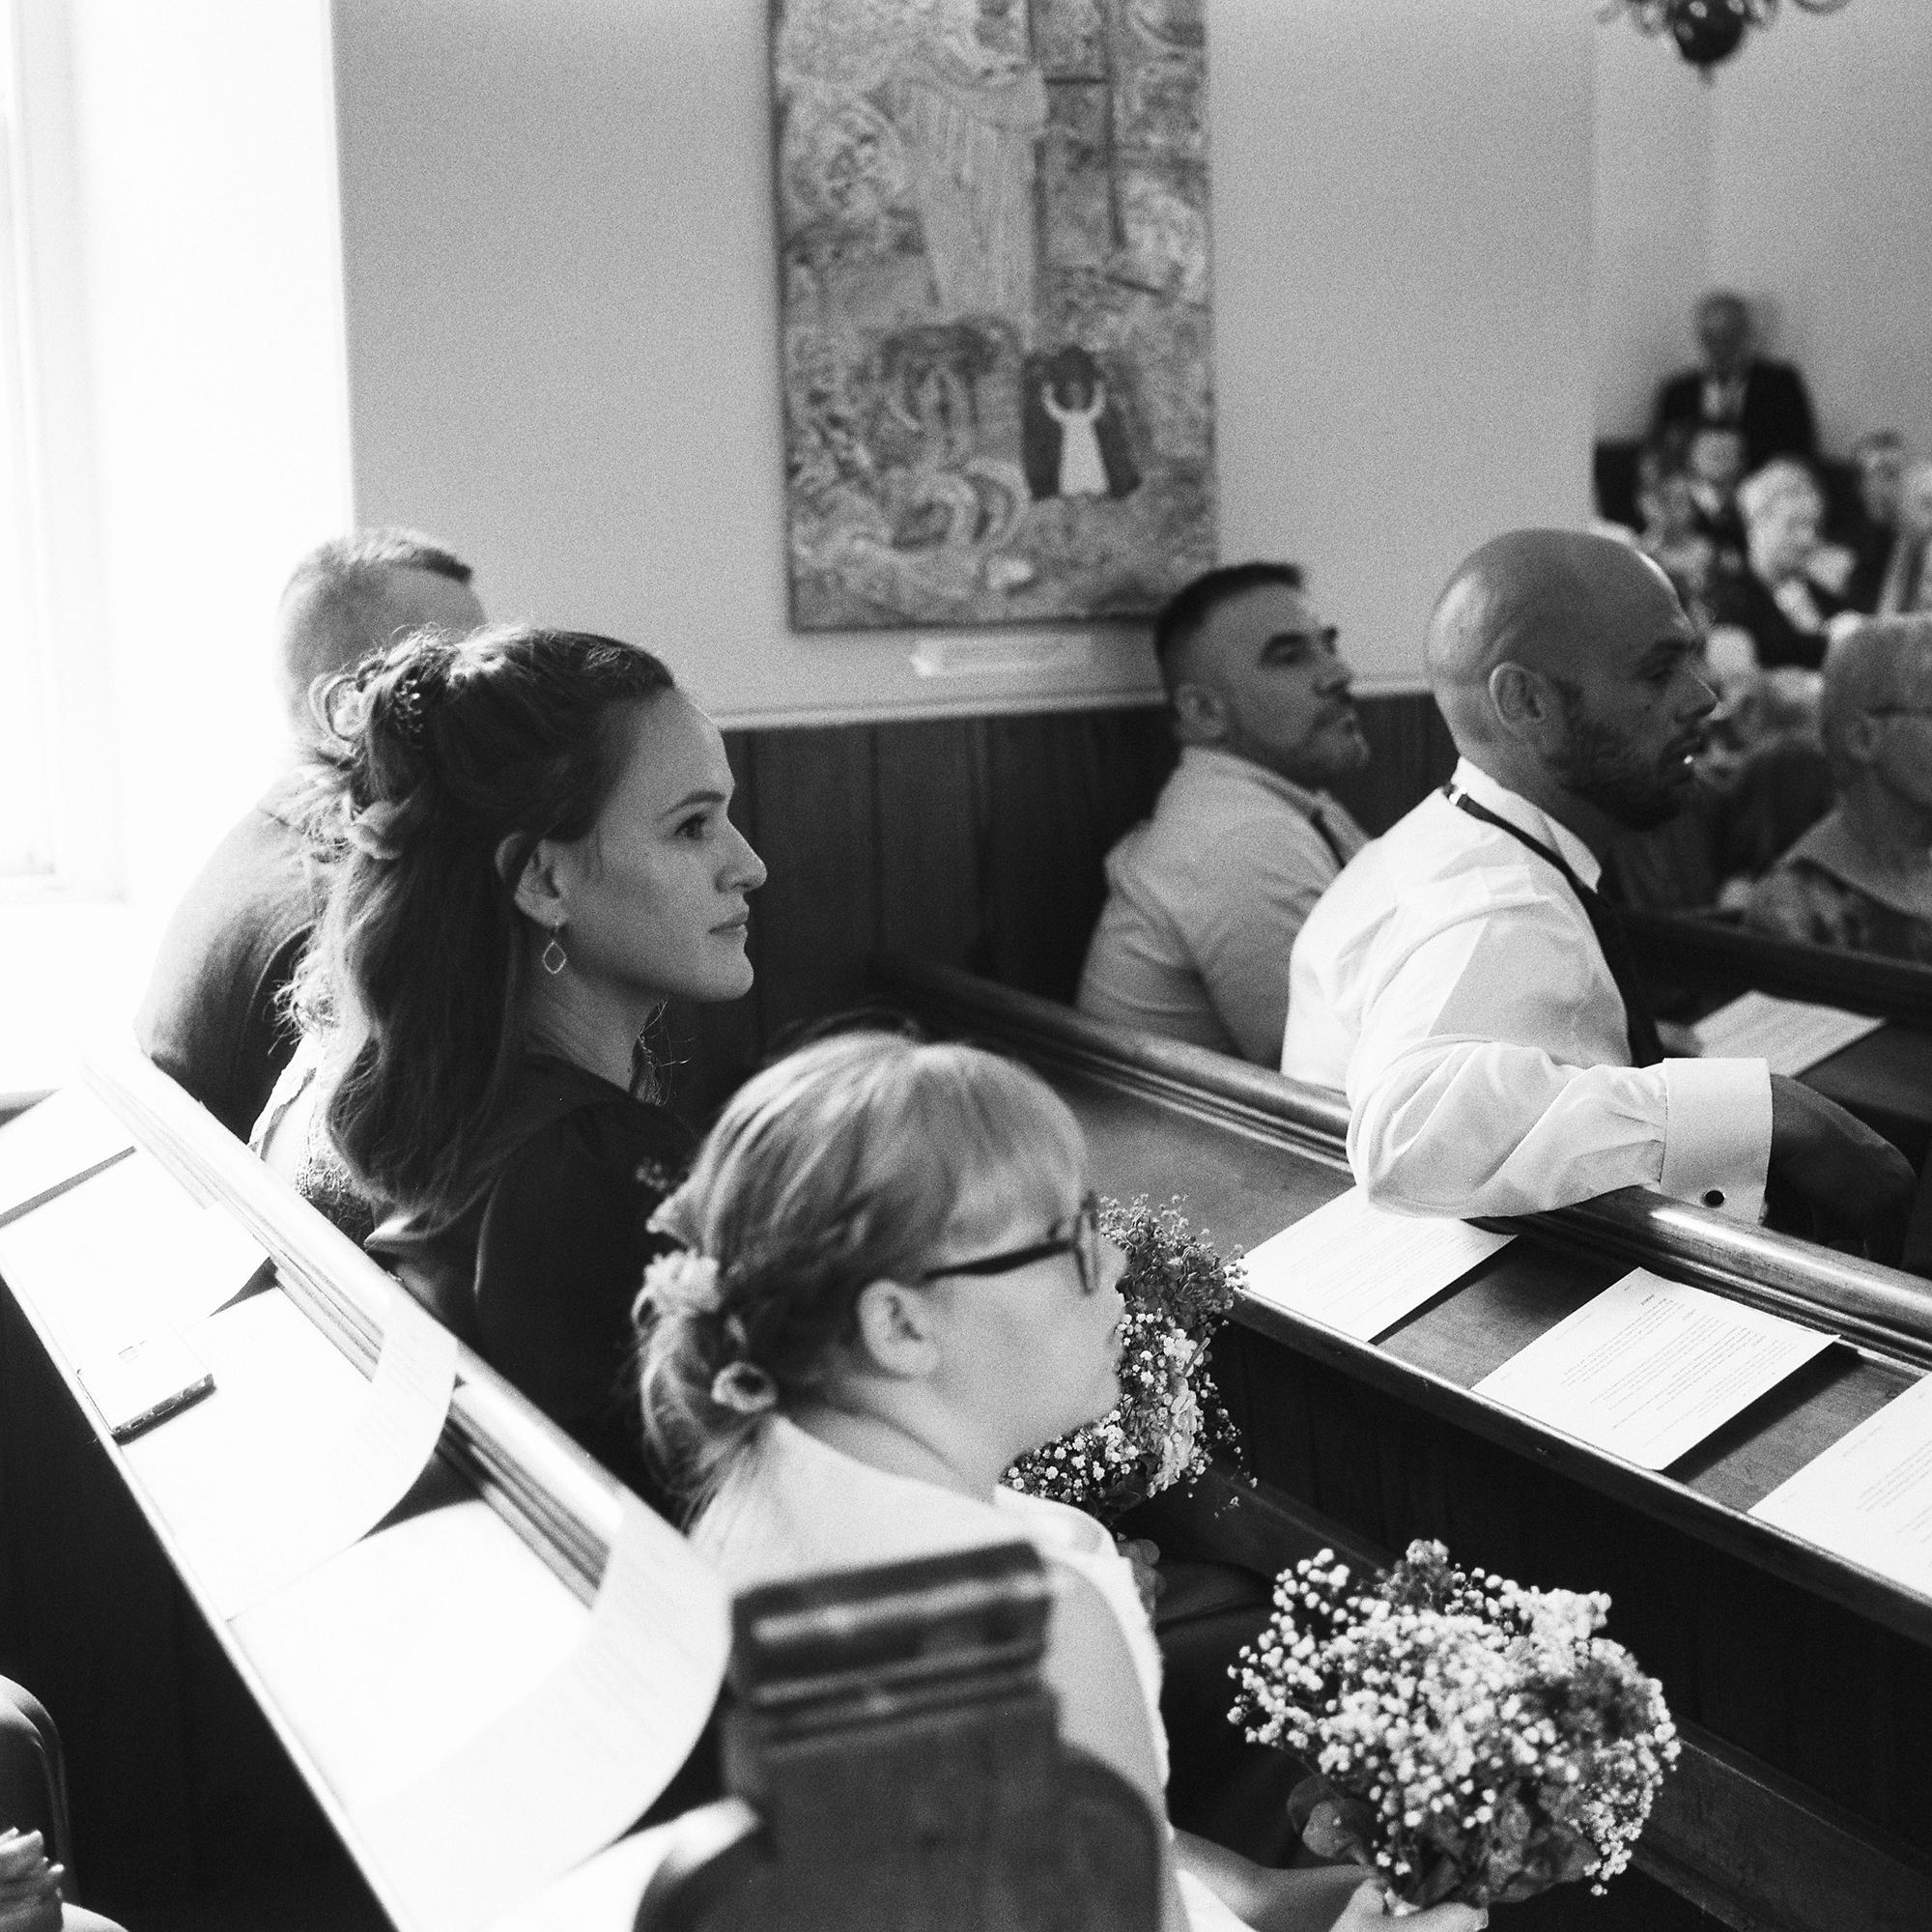 wedding-photography-scotland158.jpg